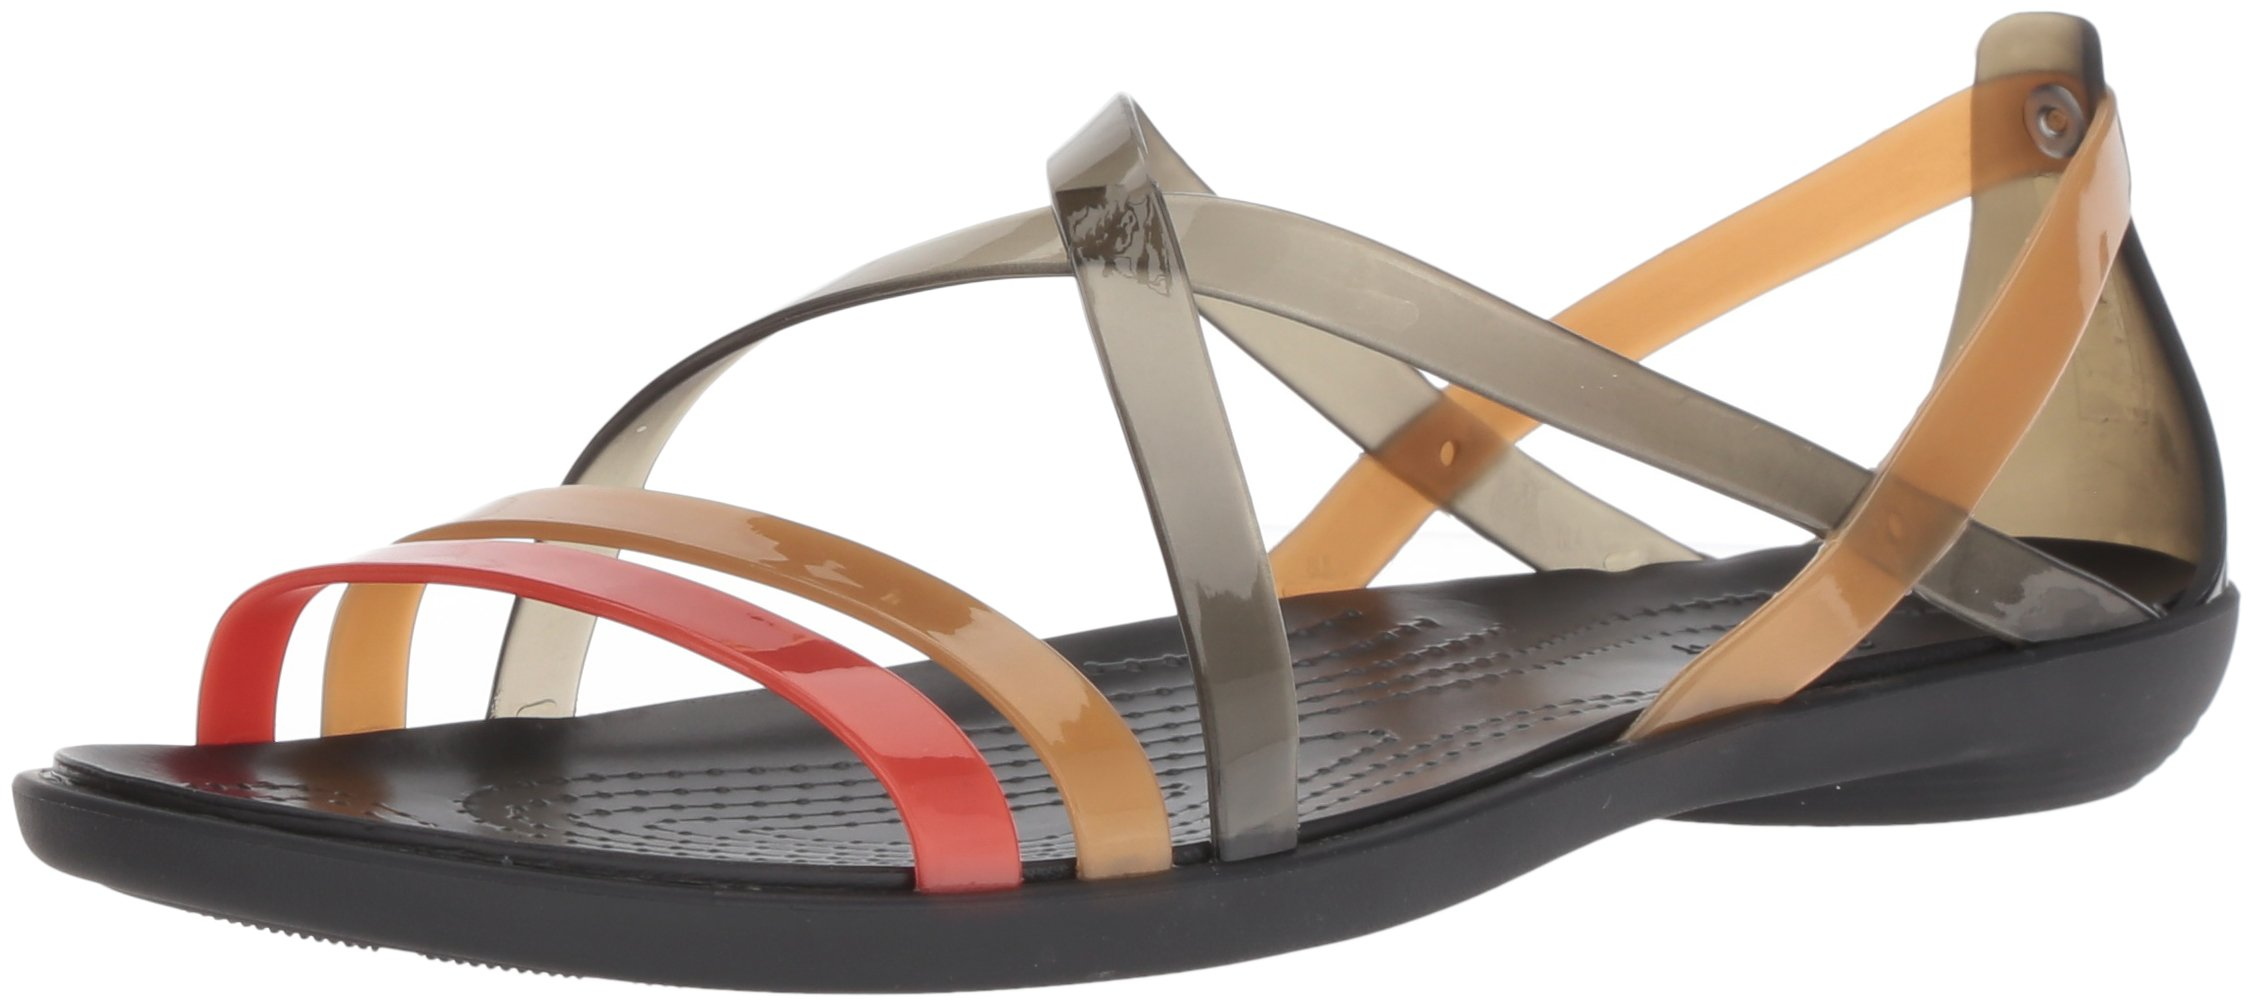 Crocs Women's Drew x Isabella Sdl W Flat Sandal, Black/Gold, 8 M US